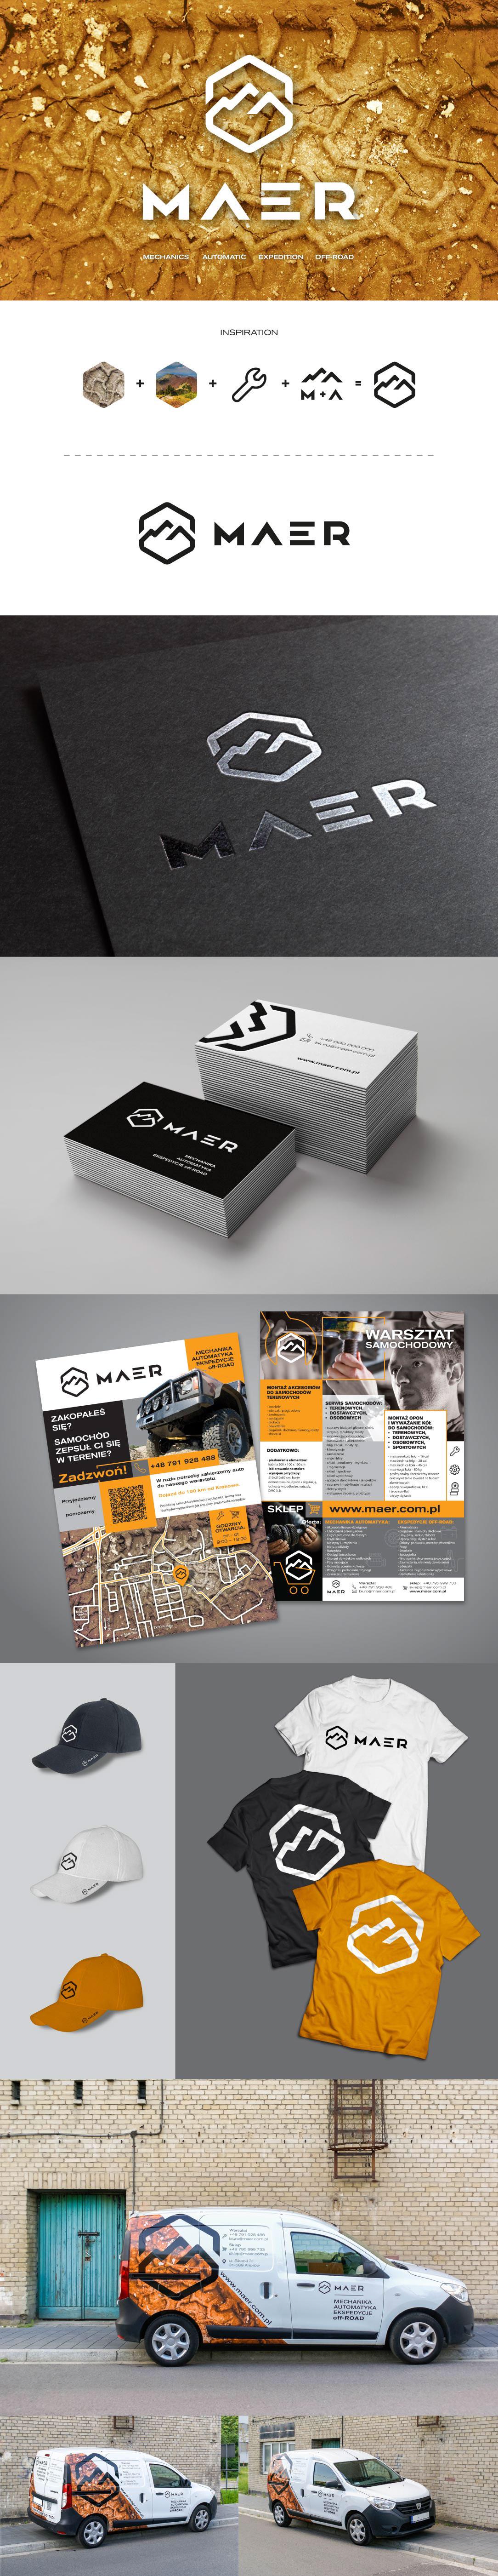 logo brand maer car card t-shirt cap flyer brochure